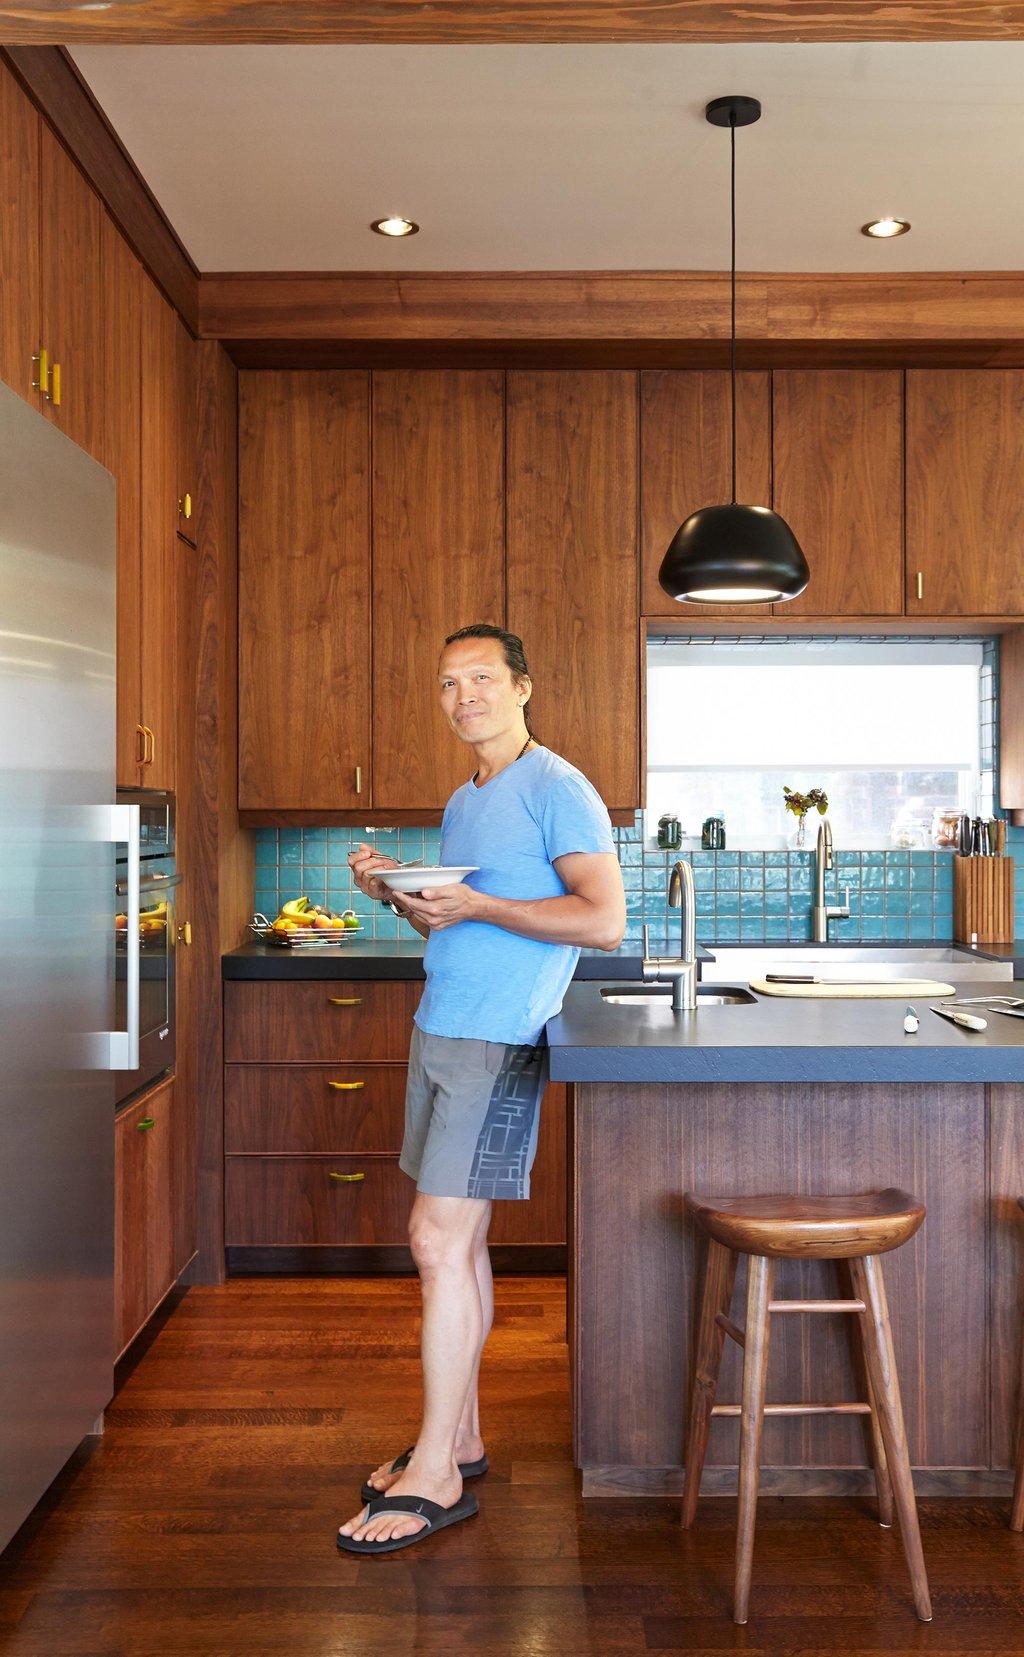 Toronto Life & Inside chef Susur Lee\u0027s kitchen | Toronto Life